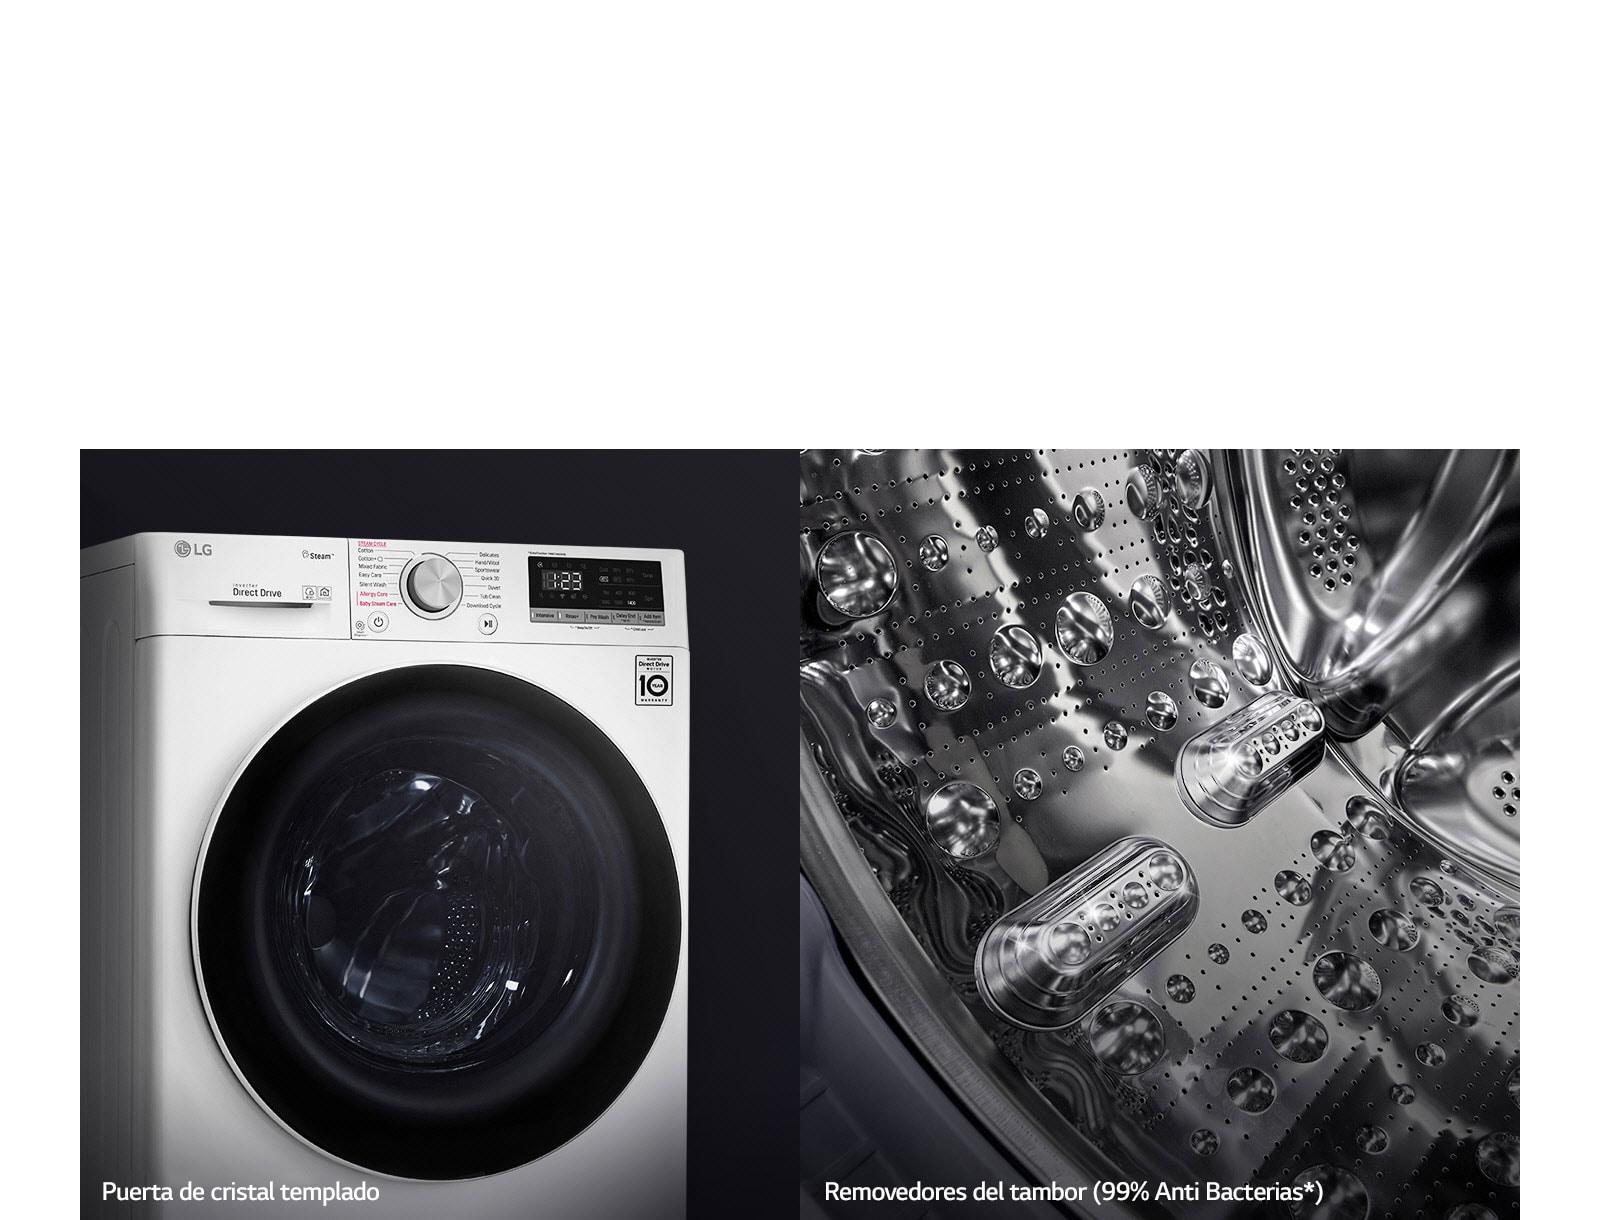 WM-Vivace-V400-C4R-White-05-1-Druability-Desktop_v1